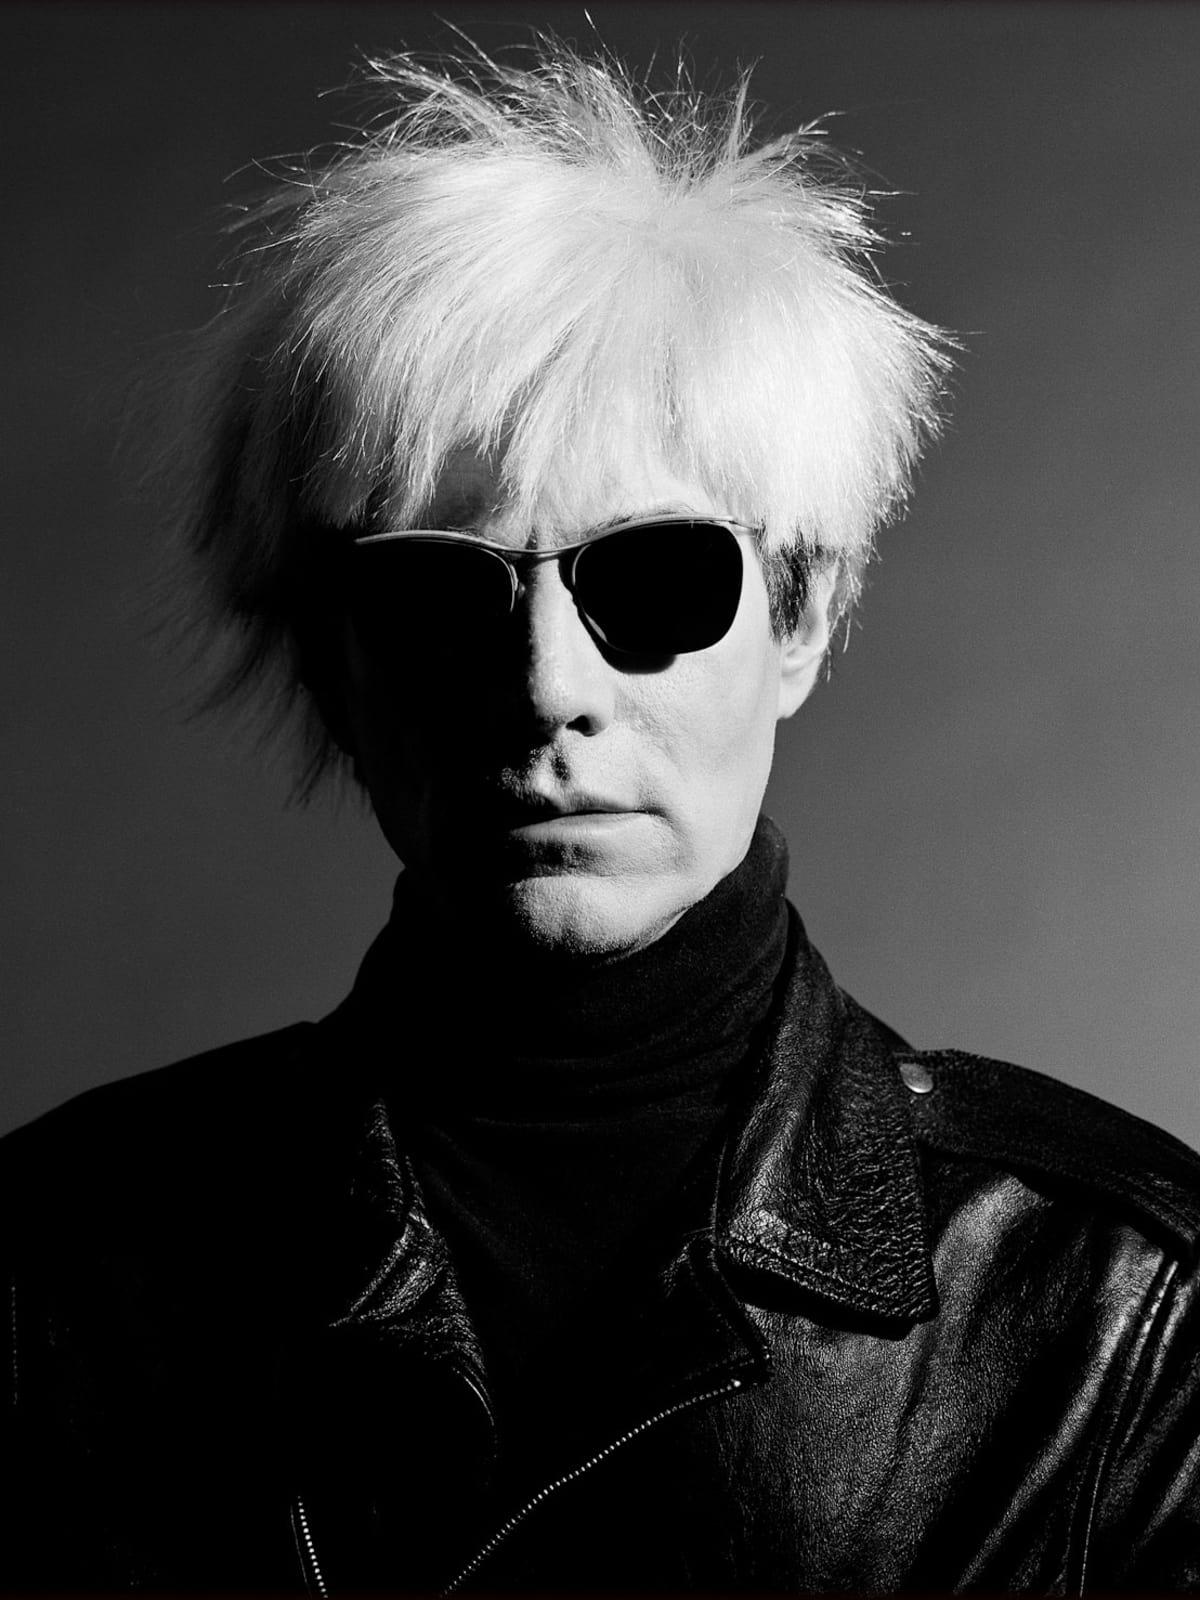 News_Greg Gorman_Andy Warhol